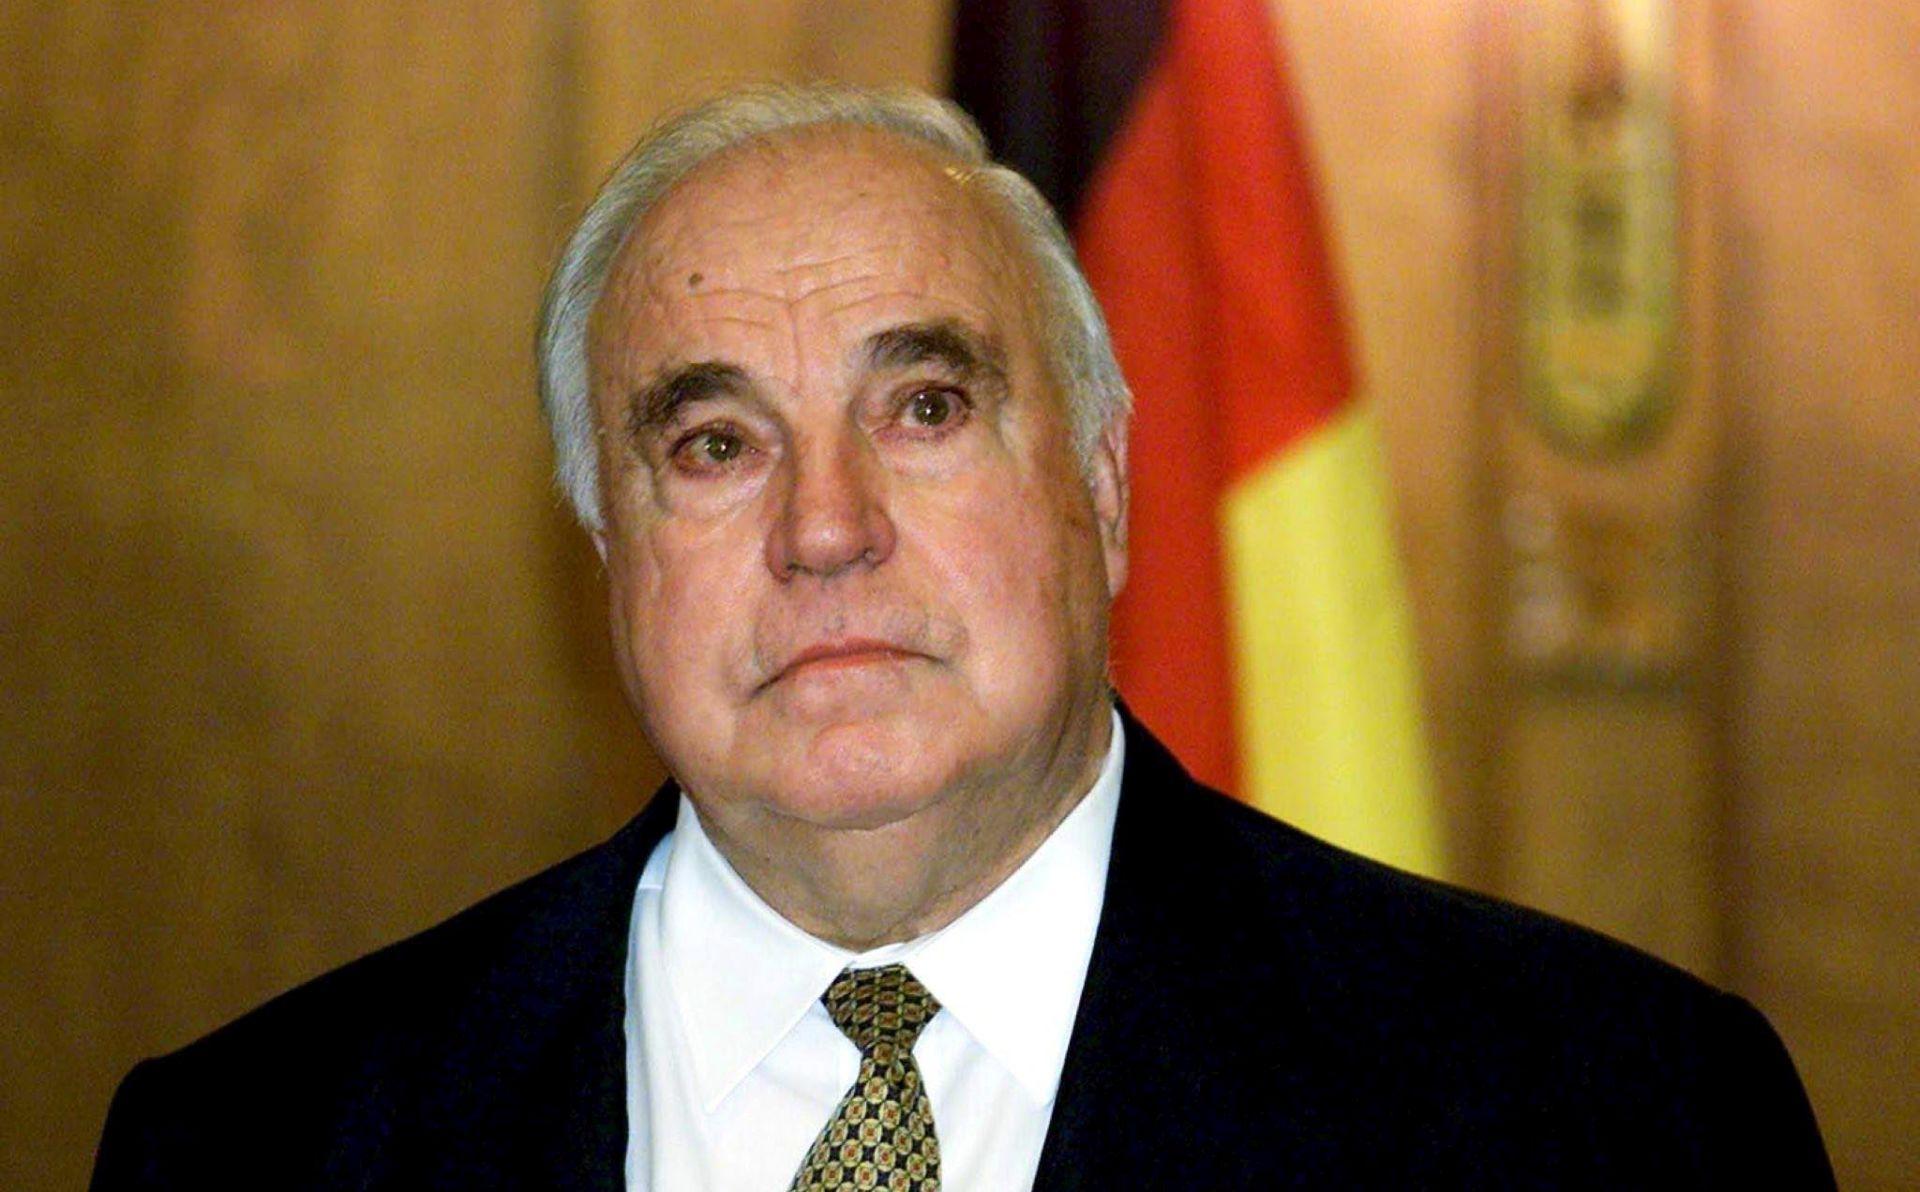 Sućut premijera Plenkovića kancelarki Merkel povodom smrti Helmutha Kohla